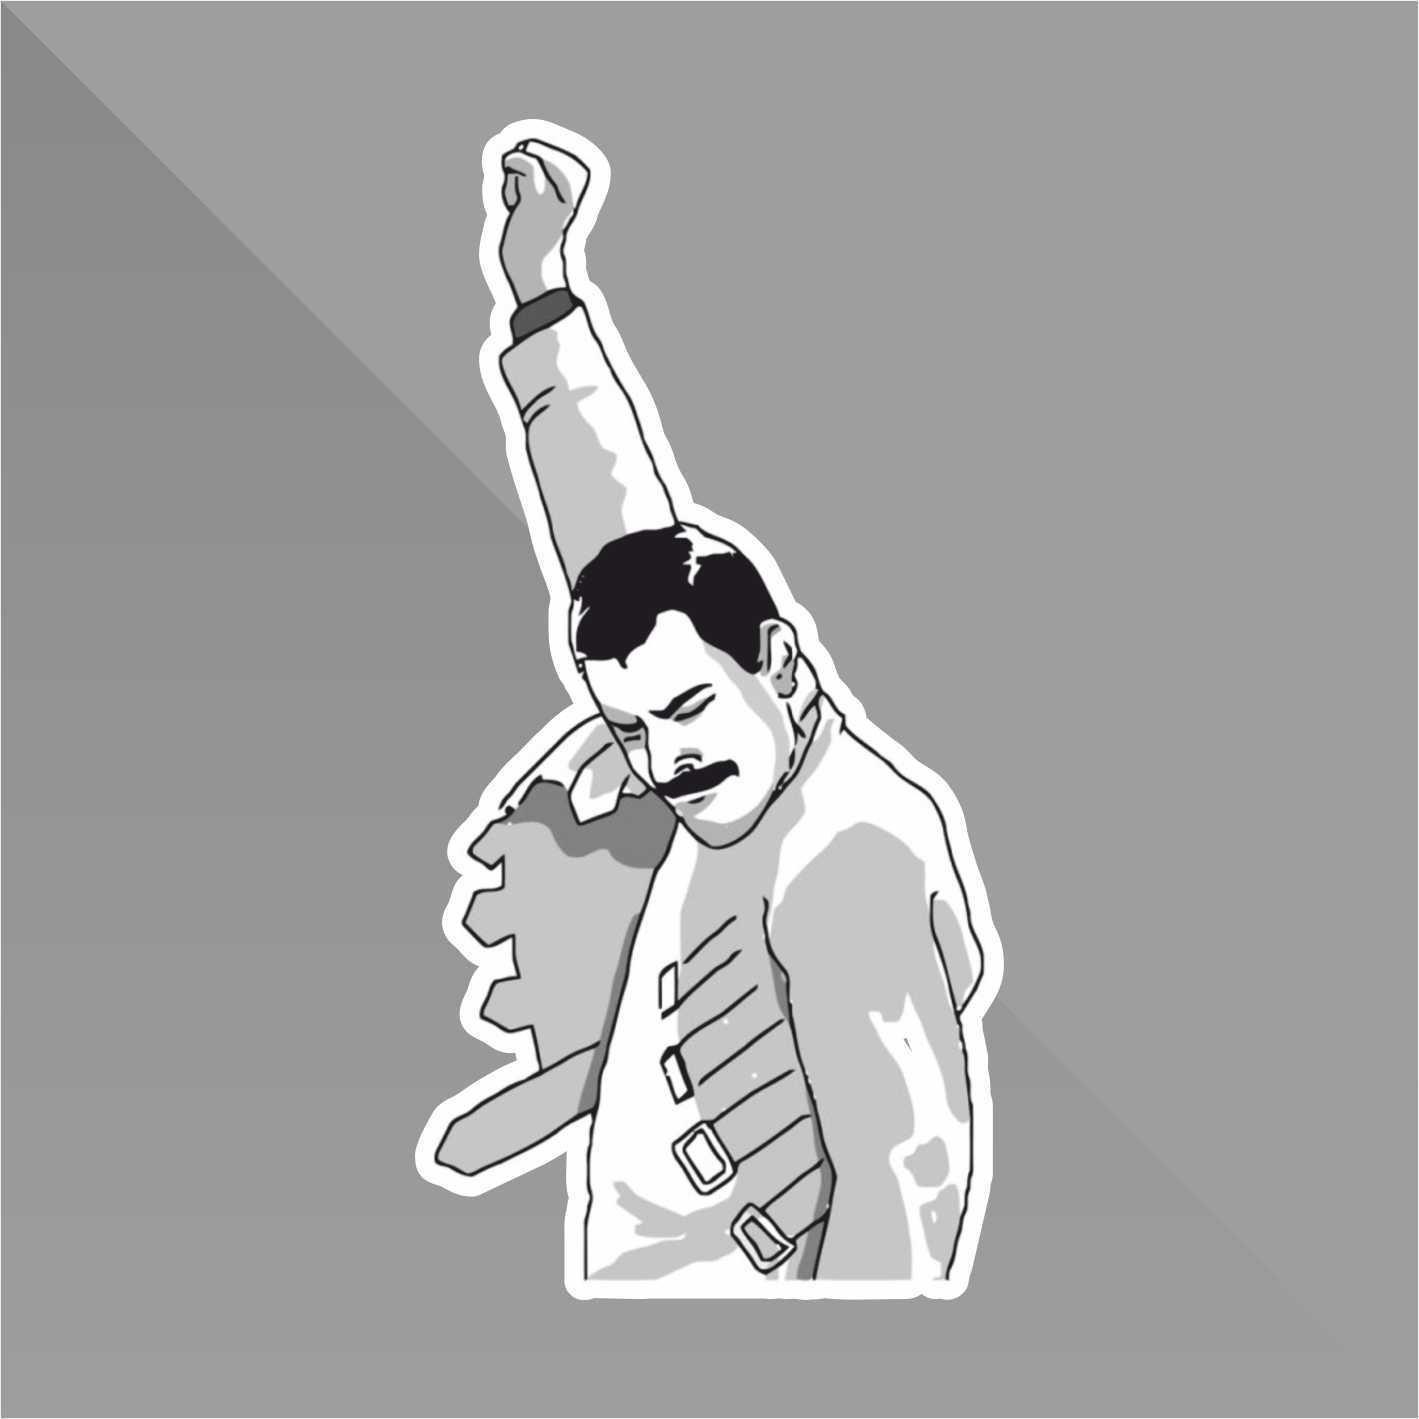 Sticker Freddie Mercury Meme Funny - Decal Auto Moto Casco Wall Camper Bike Adesivo Adhesive Autocollant Pegatina Aufkleber - cm 10 erreinge